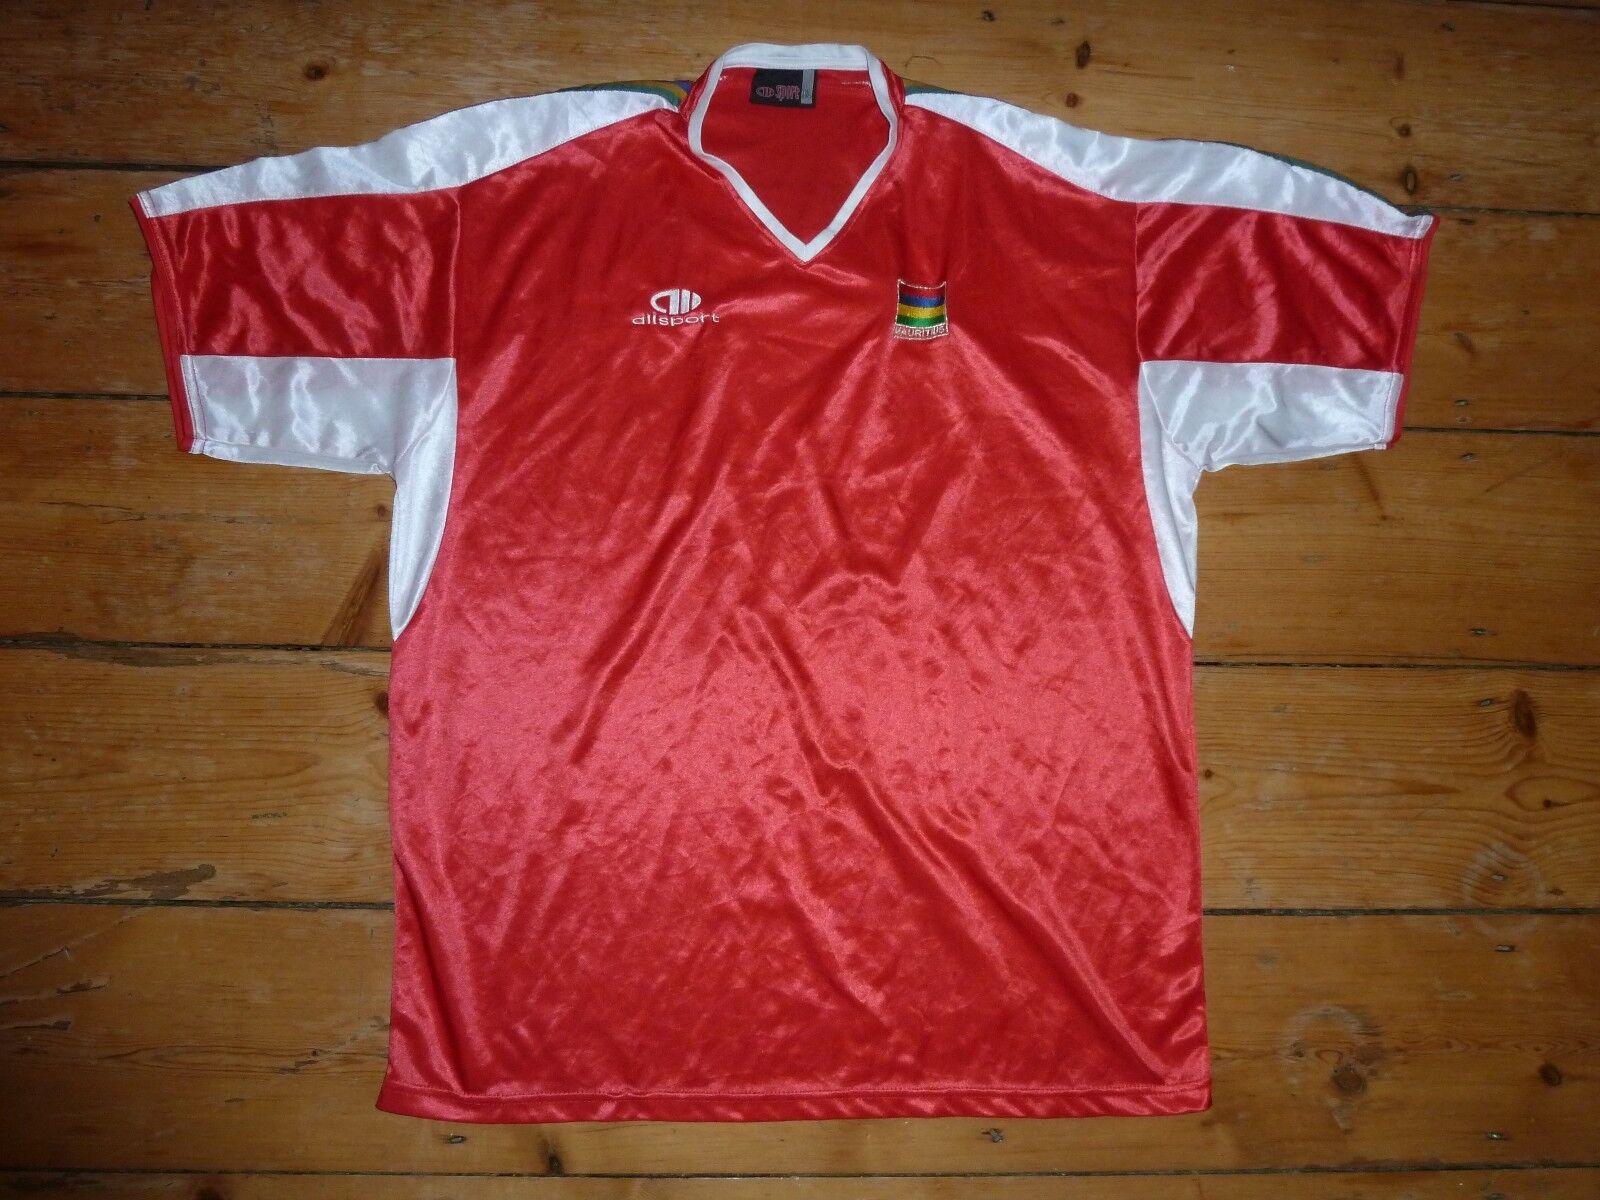 Mauritius T-Shirt Calcio 2007 [XL] Maglia Maglietta  Indossata Rétro Vintage  buscando agente de ventas